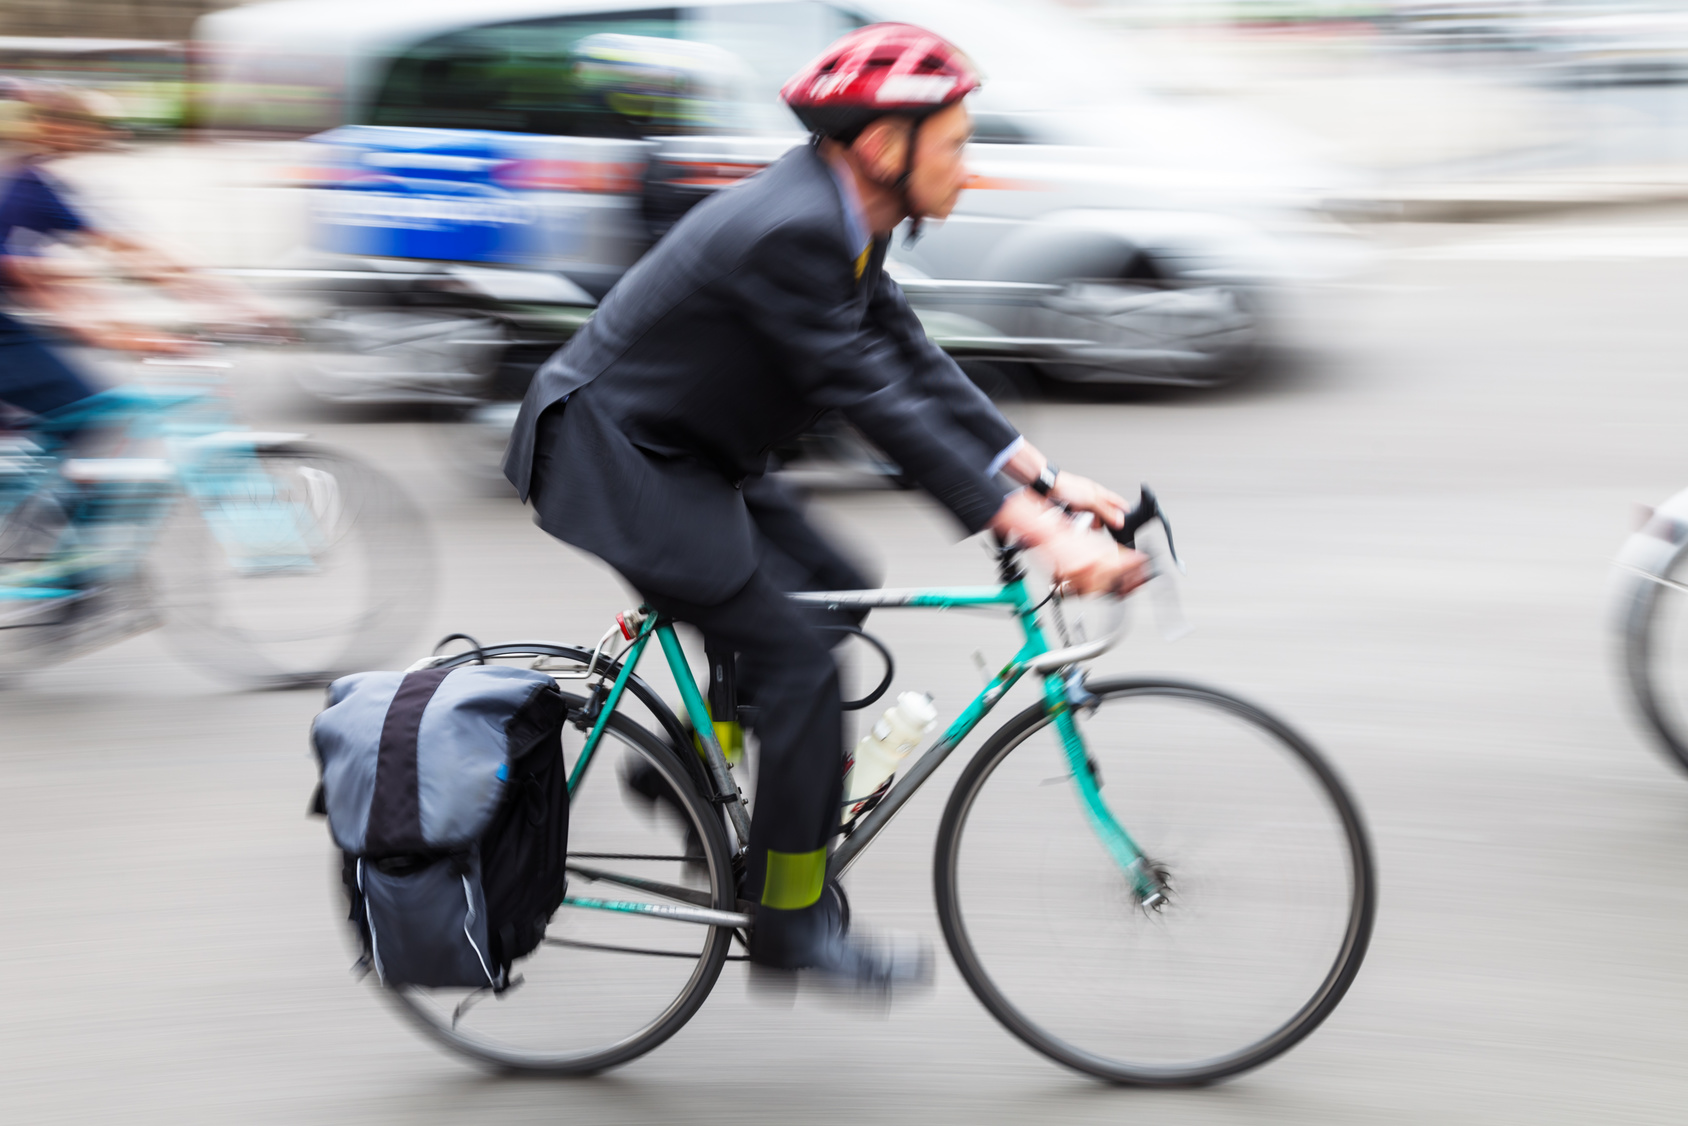 M bici ciudad